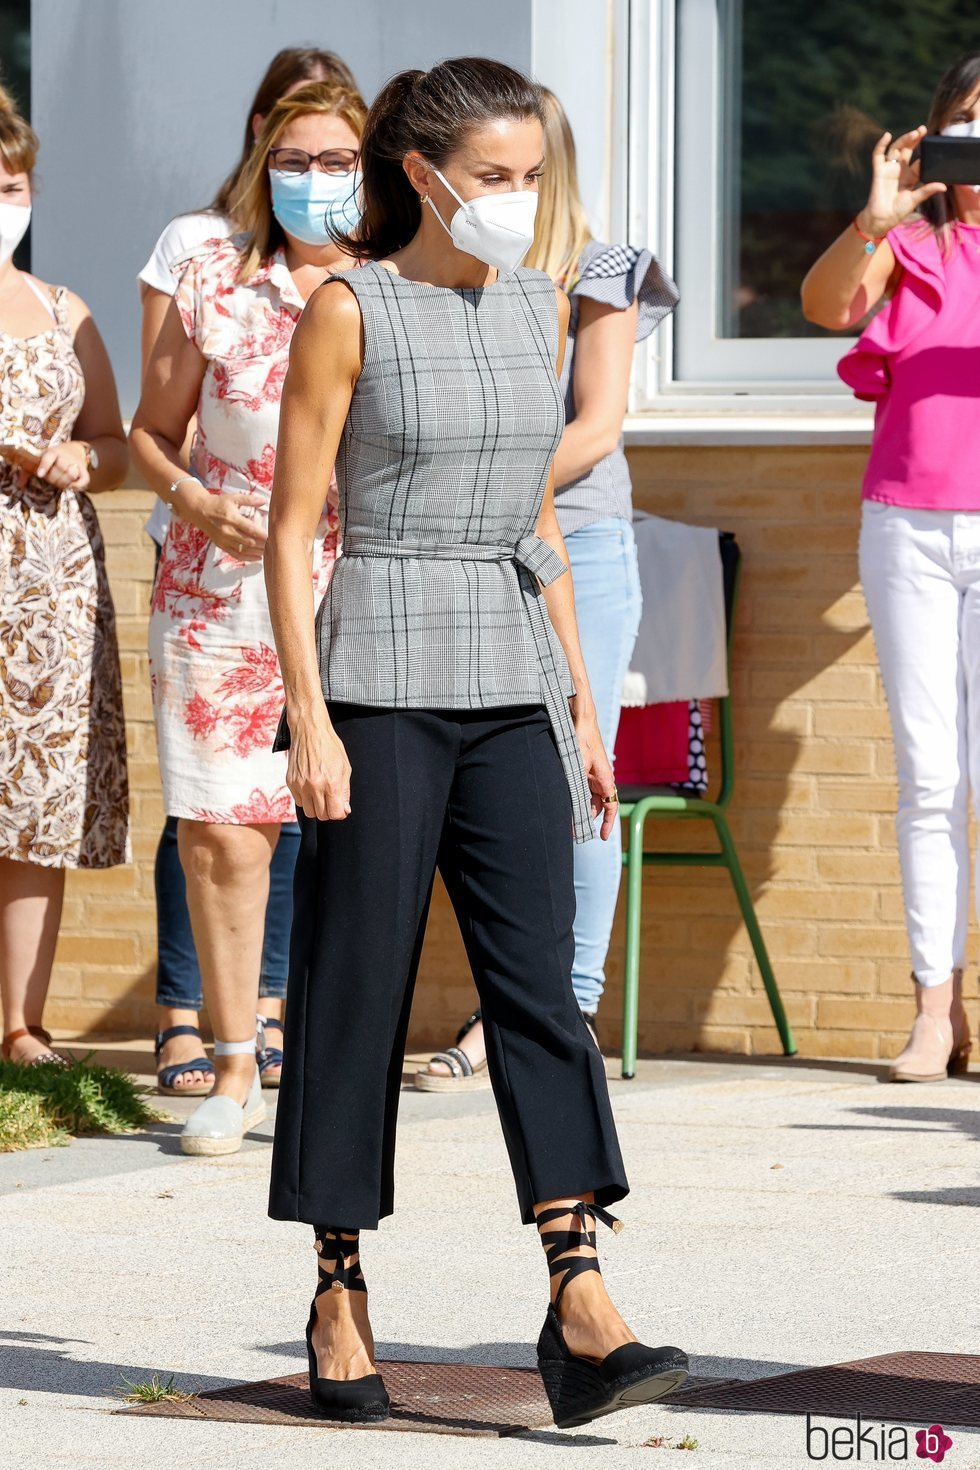 La Reina Letizia en la apertura del Curso Escolar 2020/2021